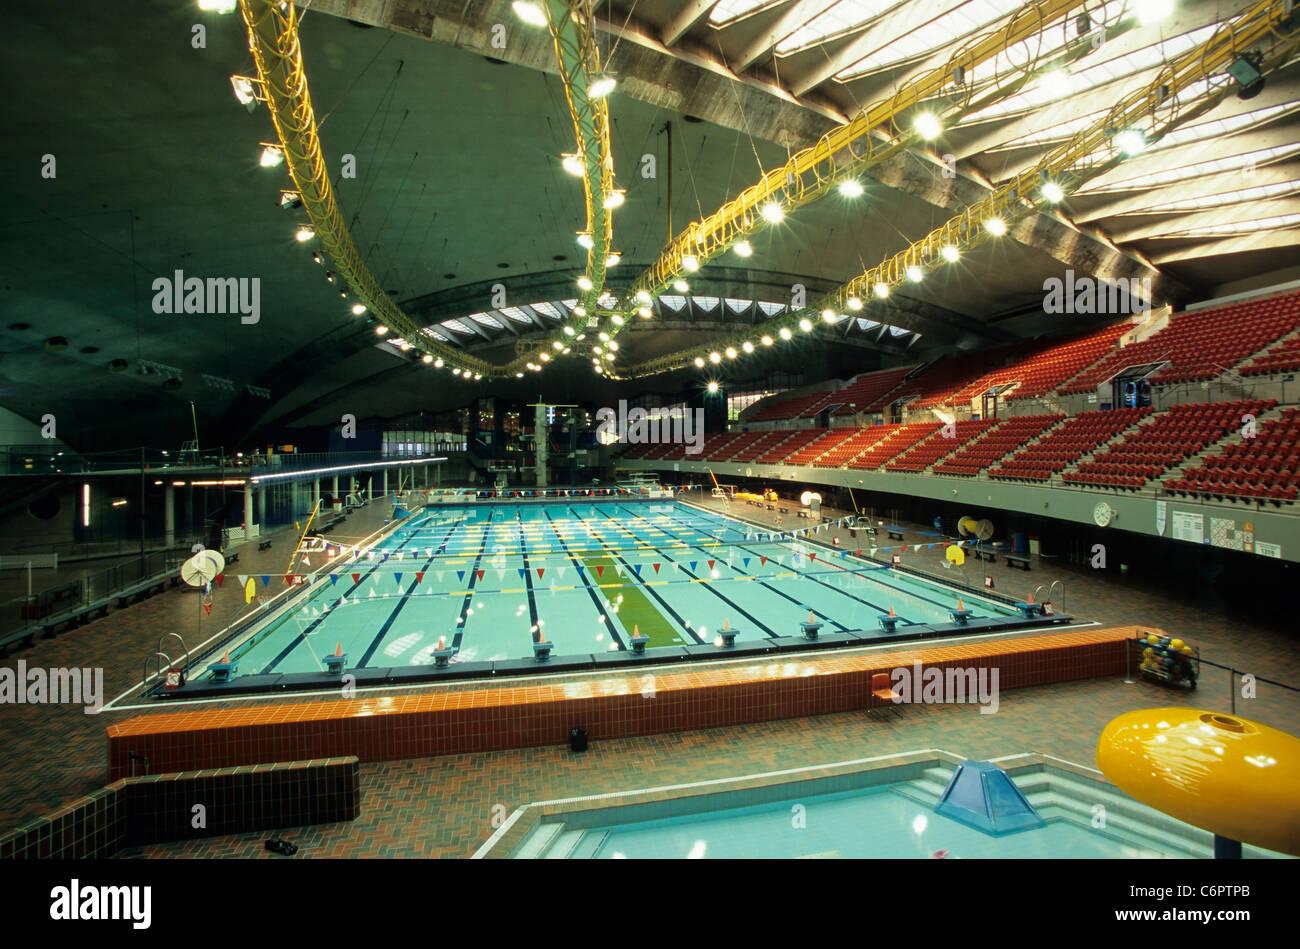 Olympic Swimming Pool Olympic Stadium Montreal Canada Stock Photo Royalty Free Image